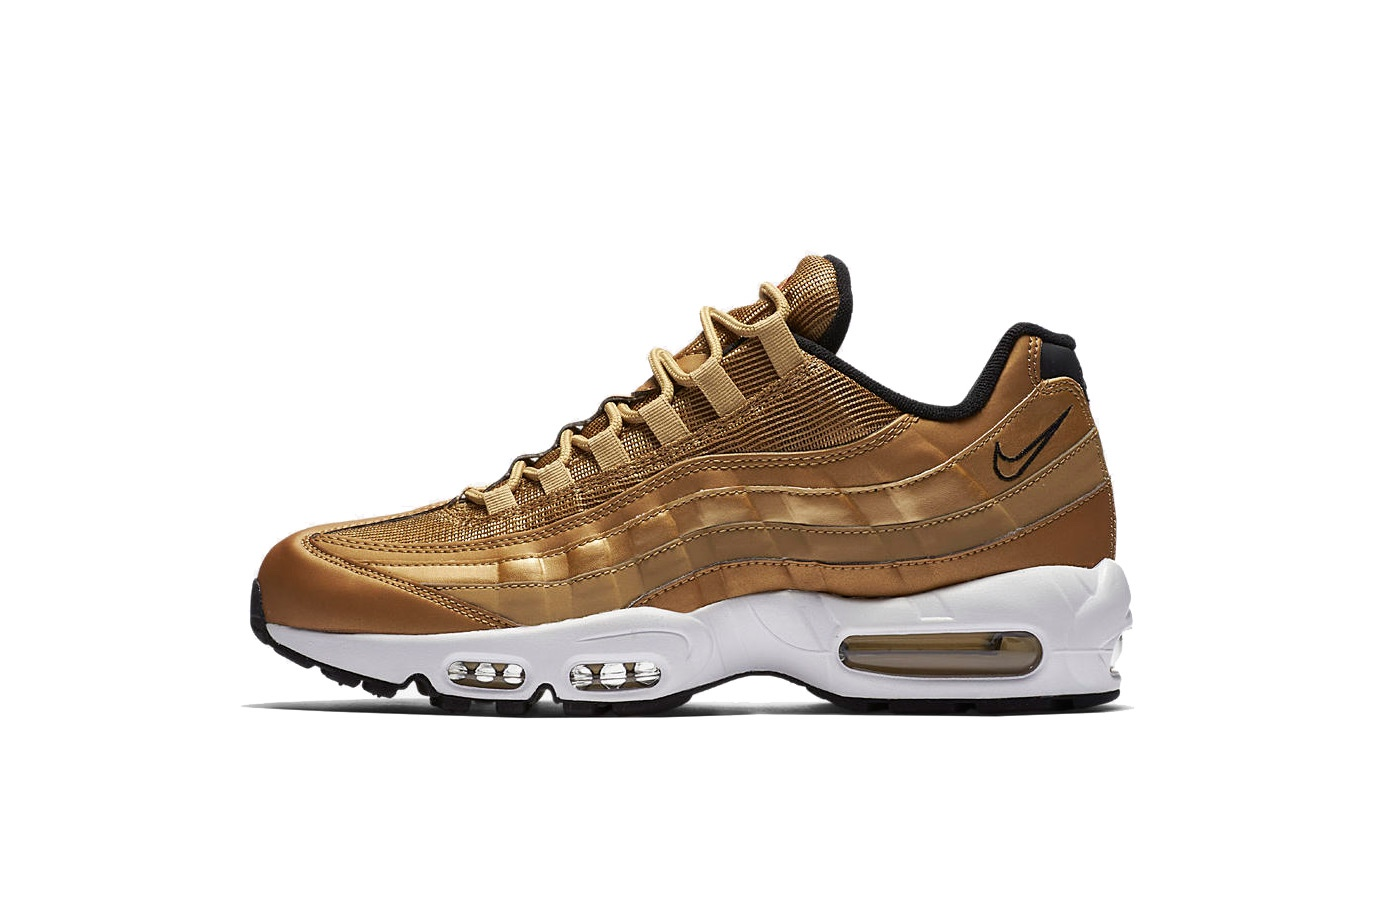 Nike va vous éblouir avec l'Air Max 95 «Metallic Gold»